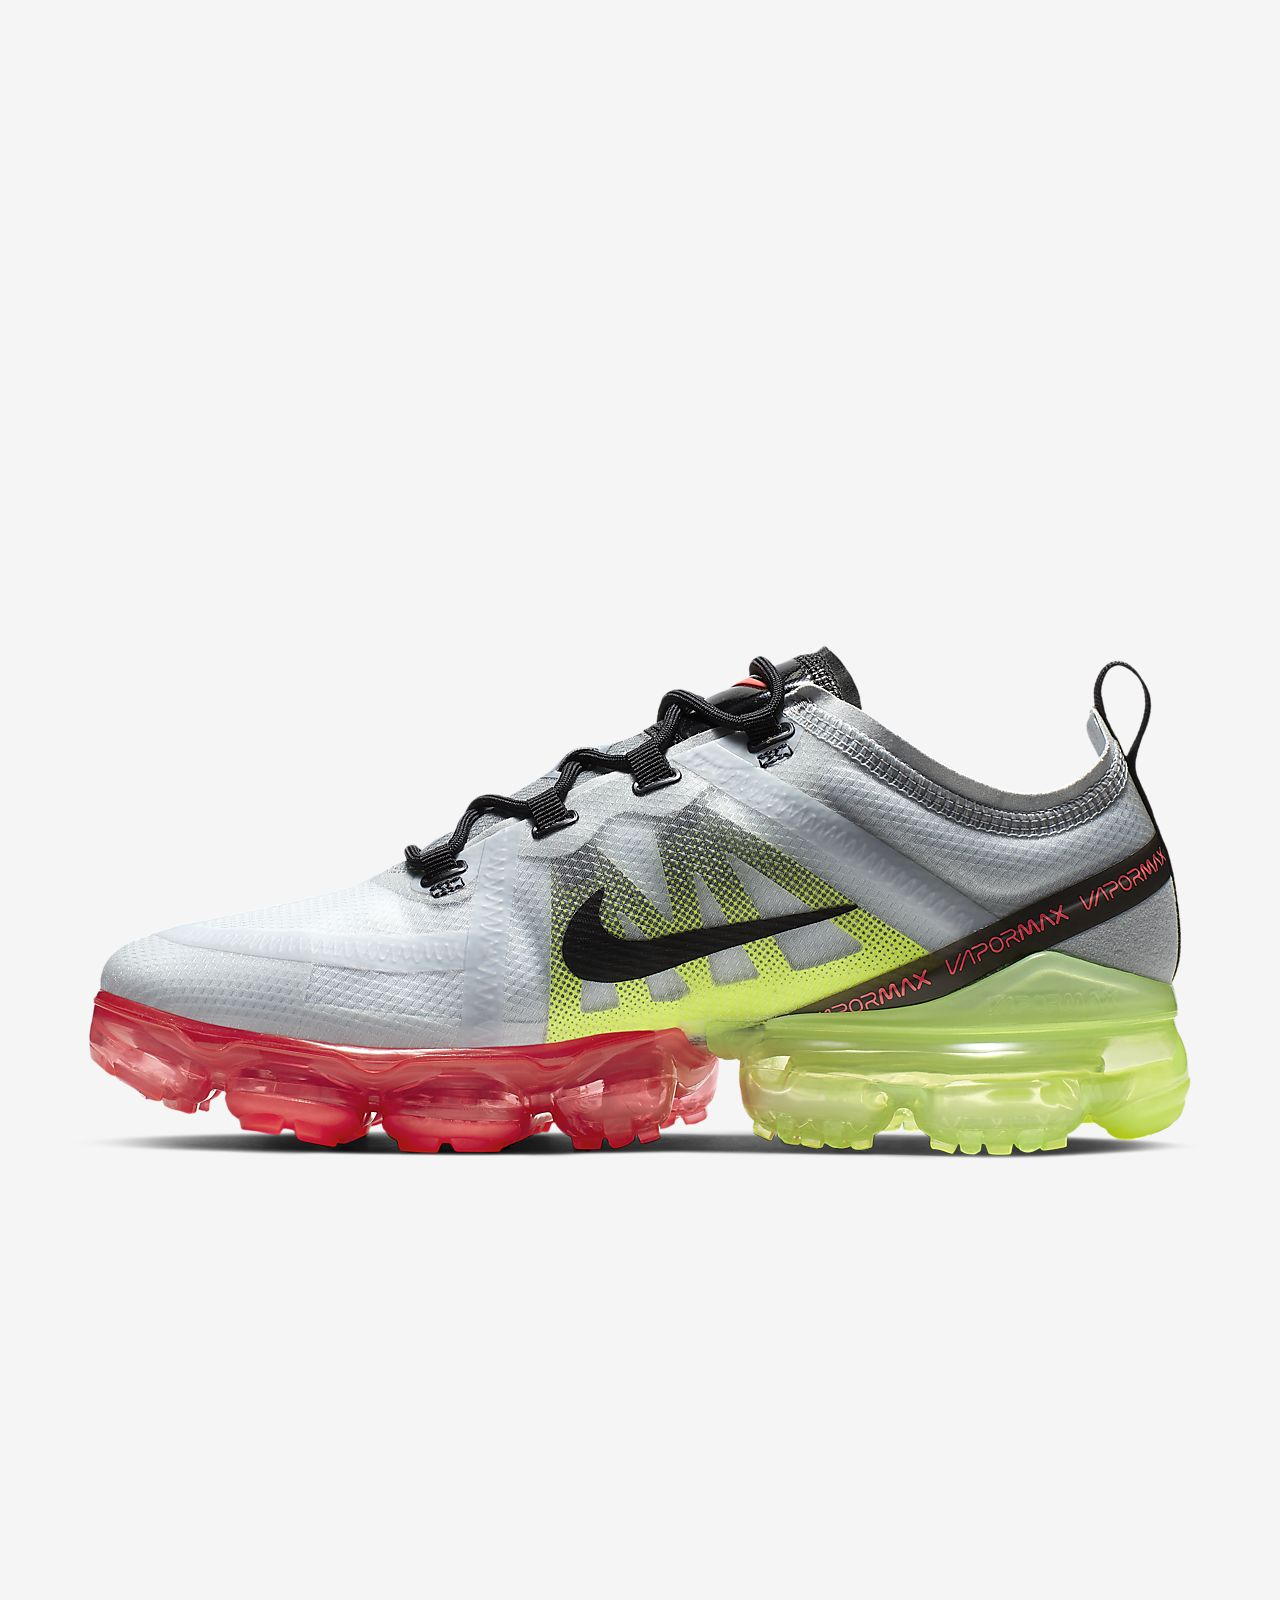 9eea0d3bb504 Calzado Nike Air VaporMax 2019. Nike.com MX